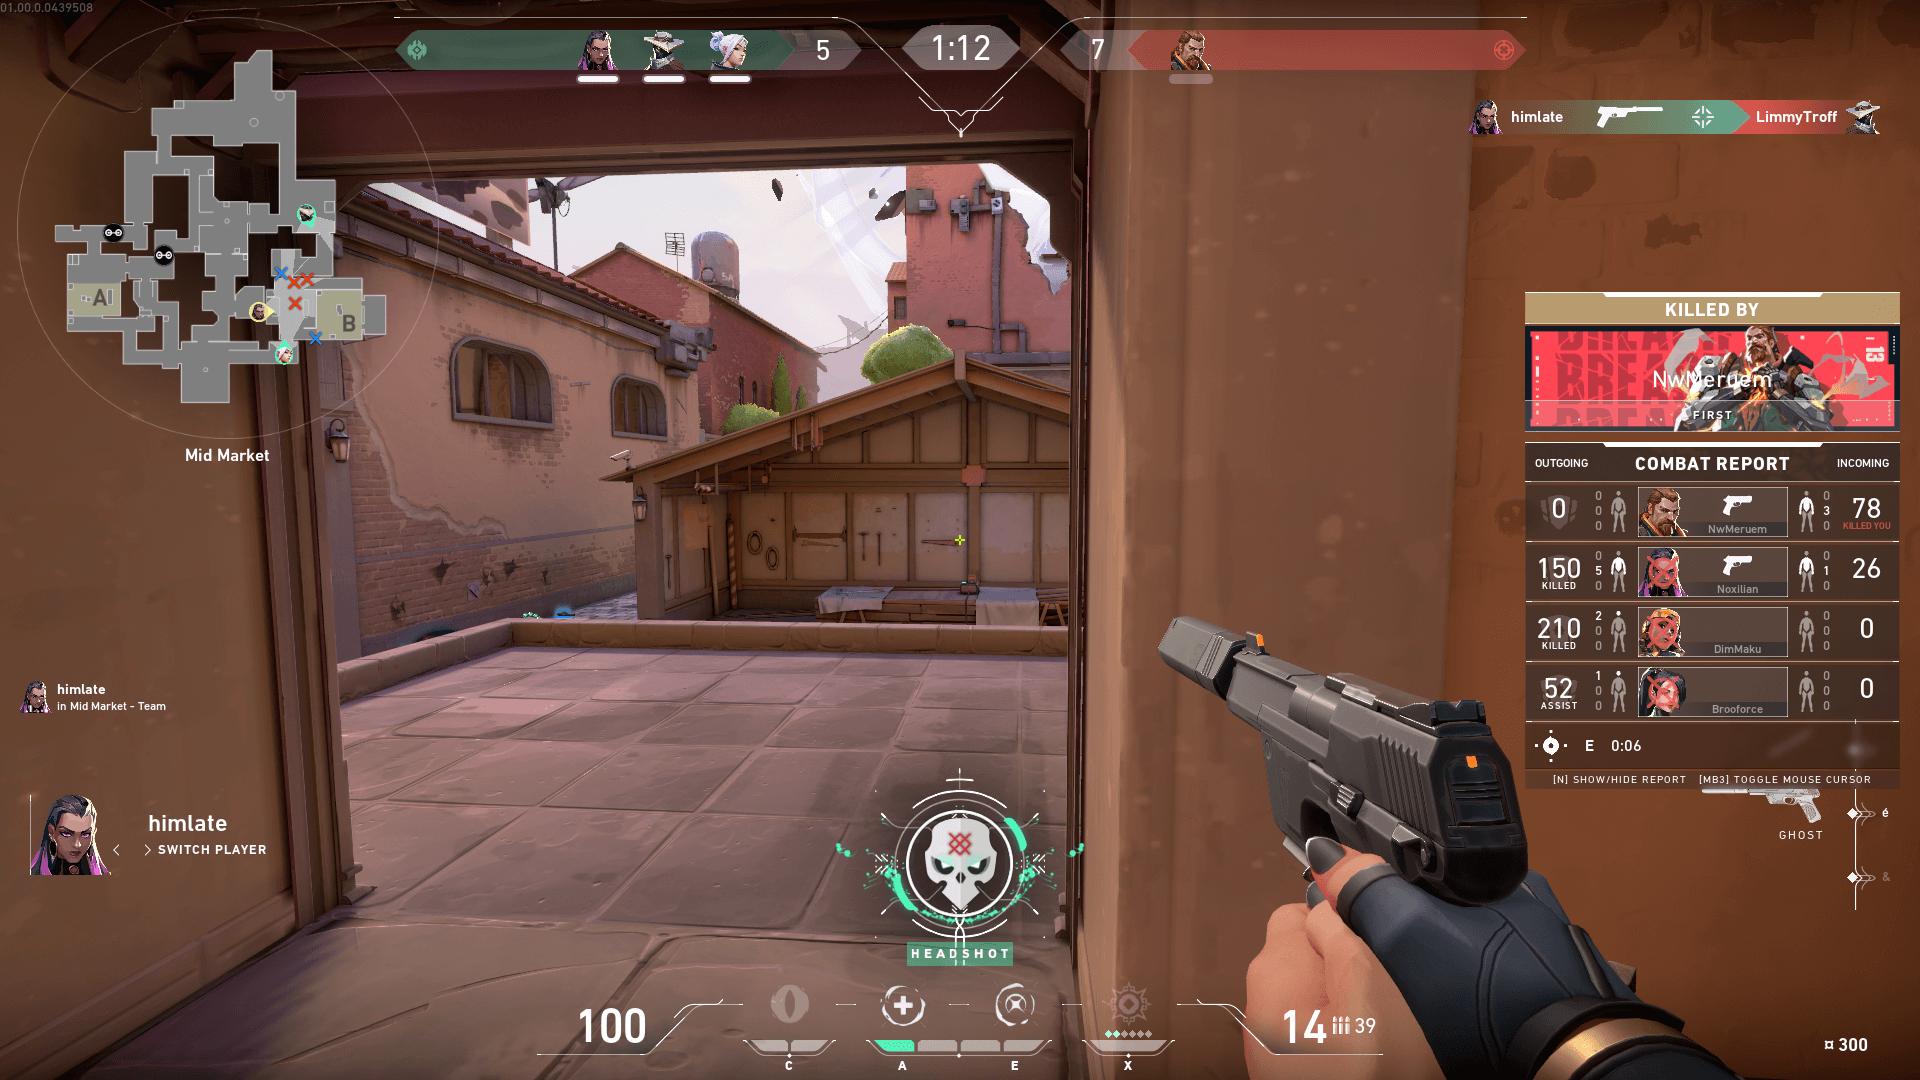 Headshot screenshot of Valorant video game interface.